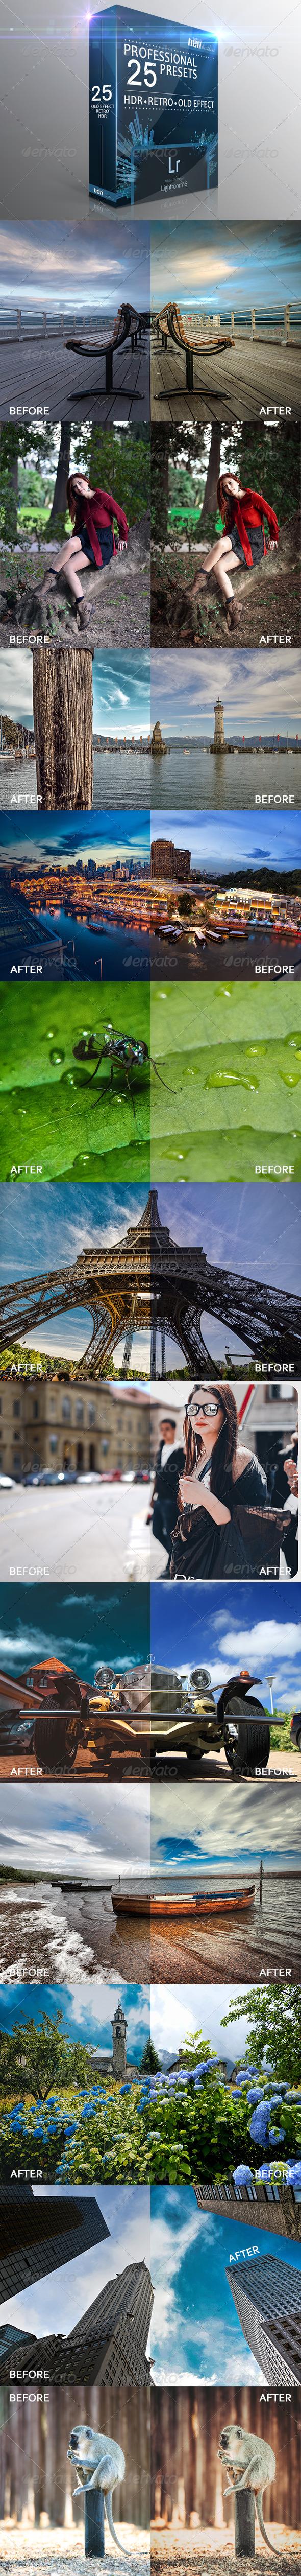 GraphicRiver 25 HDR Retro Old Effect Lightroom Presets 8122864